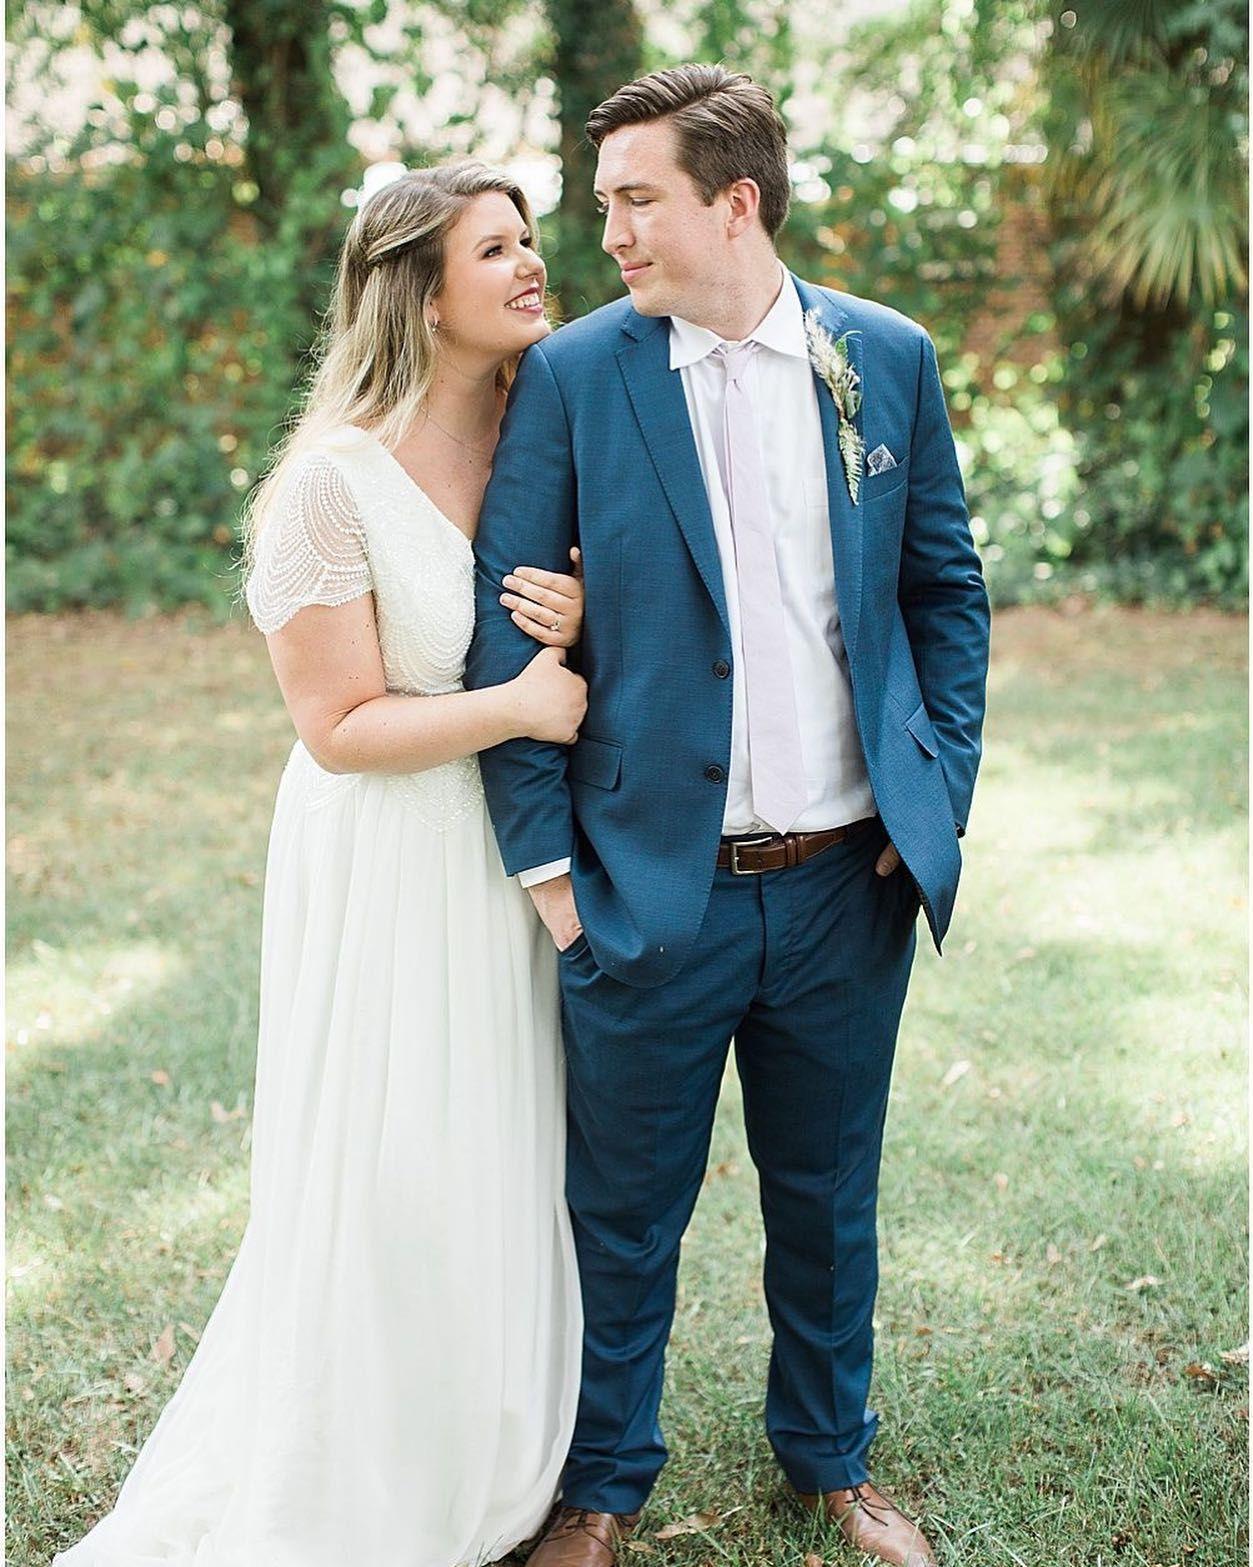 Juliet By Desiree Hartsock Wedding Dresses In 2020 Lace Wedding Dress Vintage Ball Gown Wedding Dress Wedding Dresses Lace